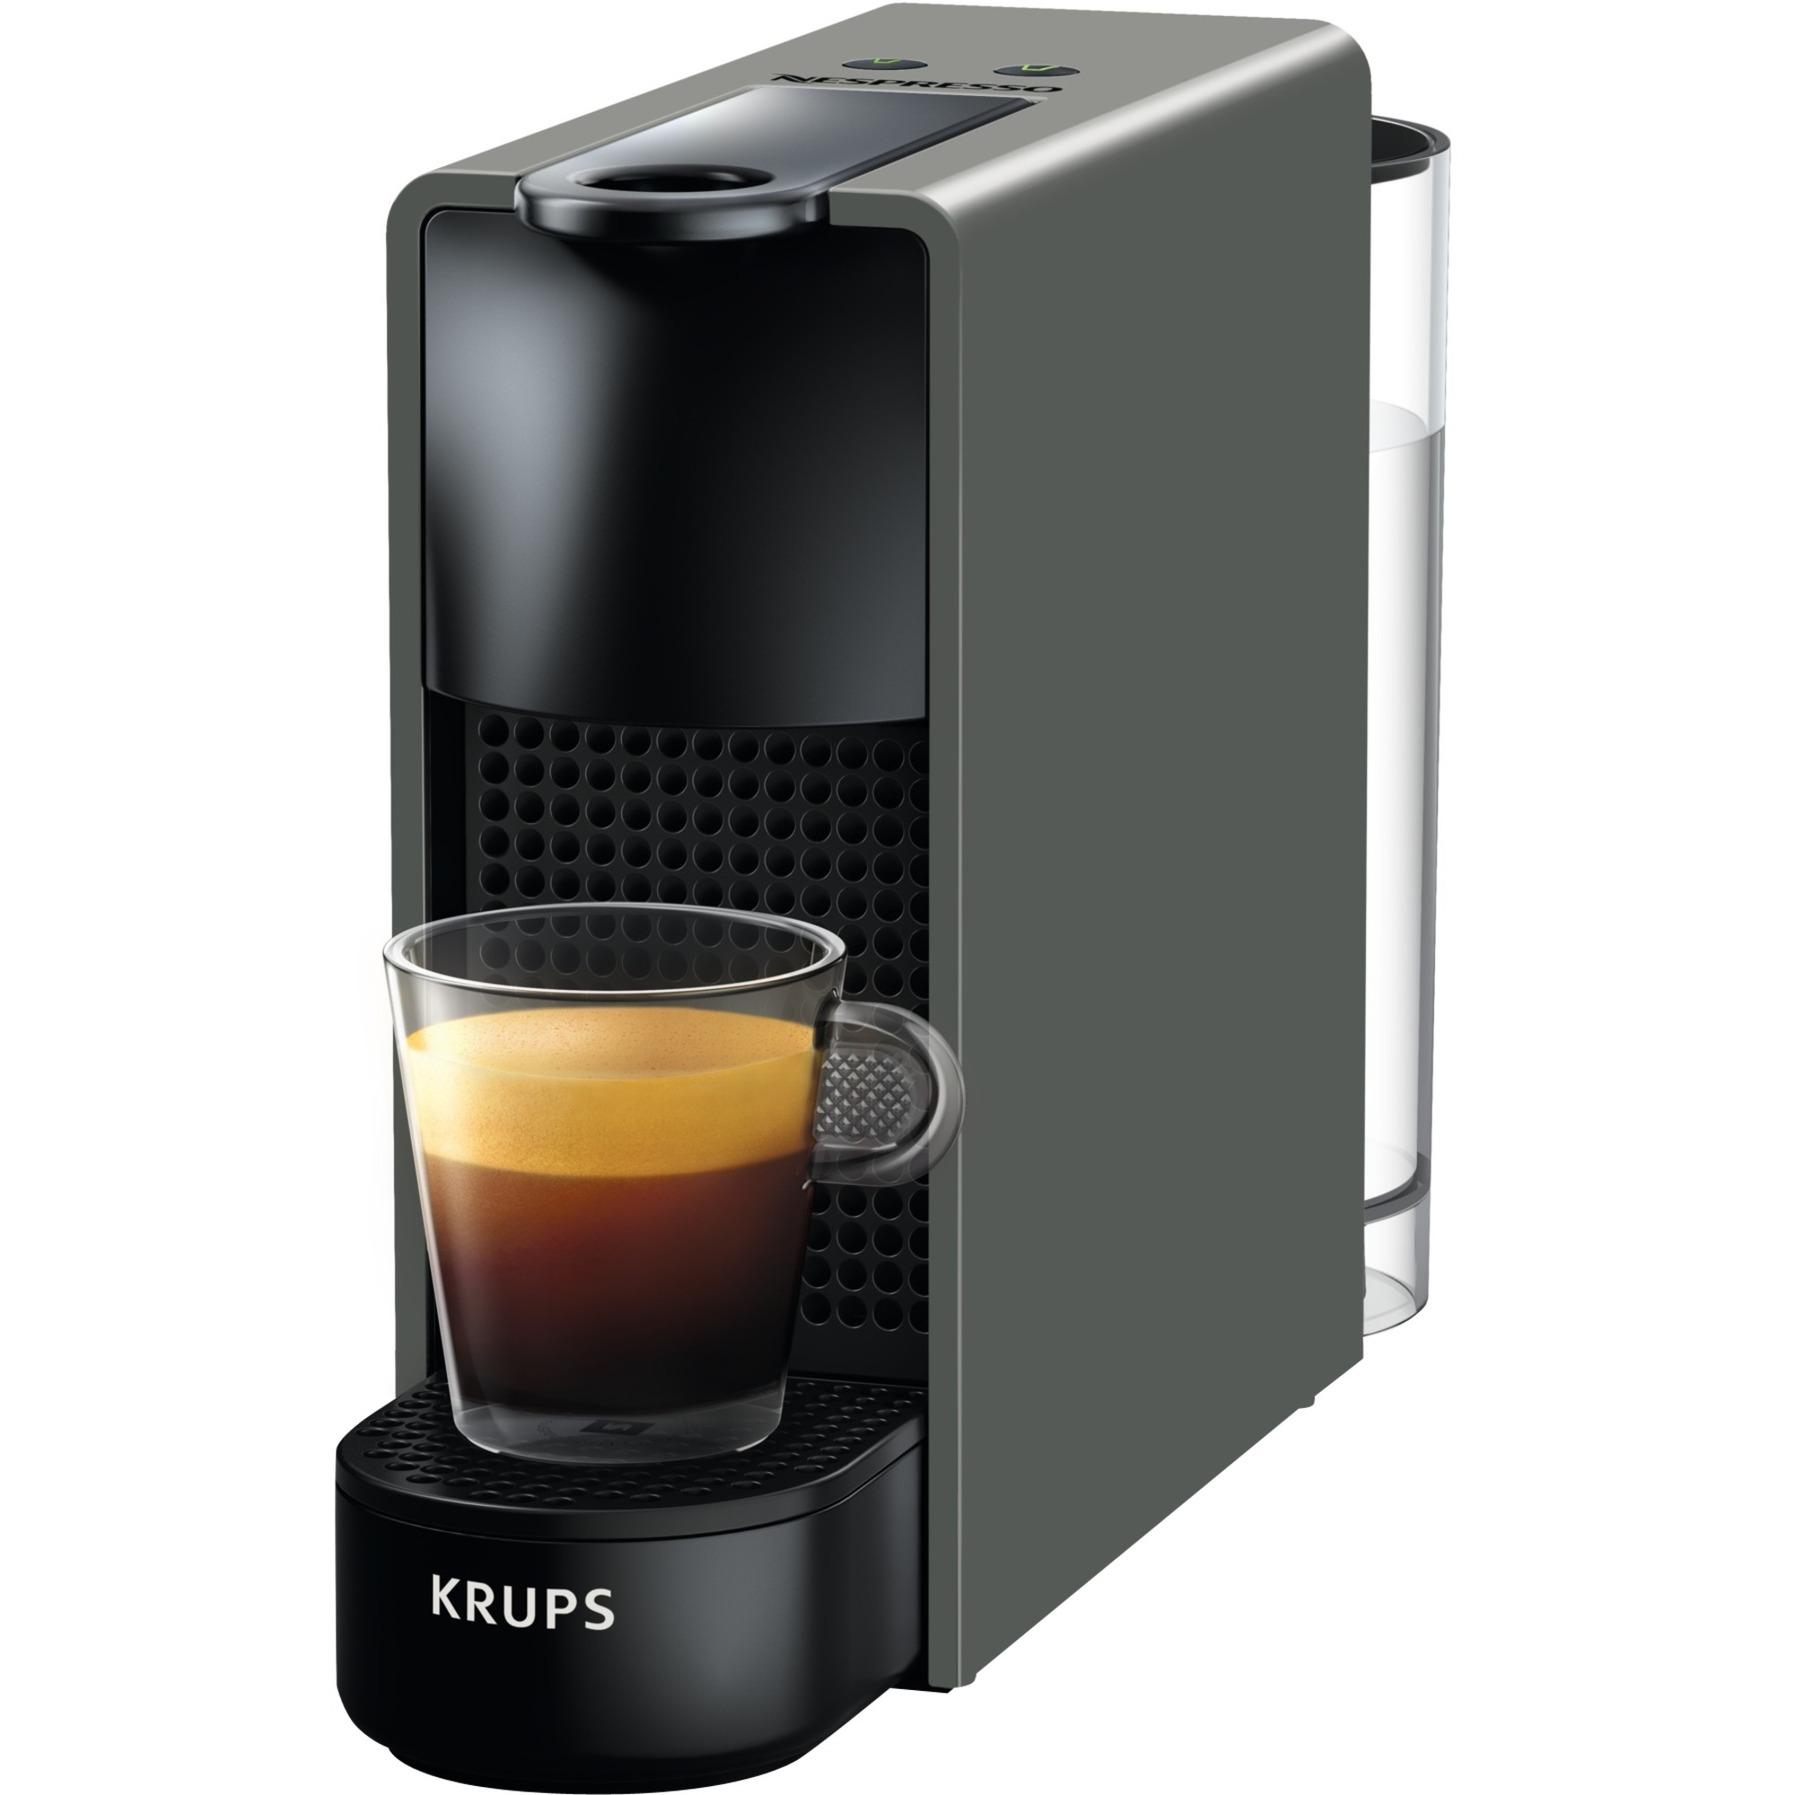 Essenza Mini XN110B10 Independiente Máquina de café en cápsulas Negro, Gris 0,6 L 1 tazas Manual, Cafetera de cápsulas